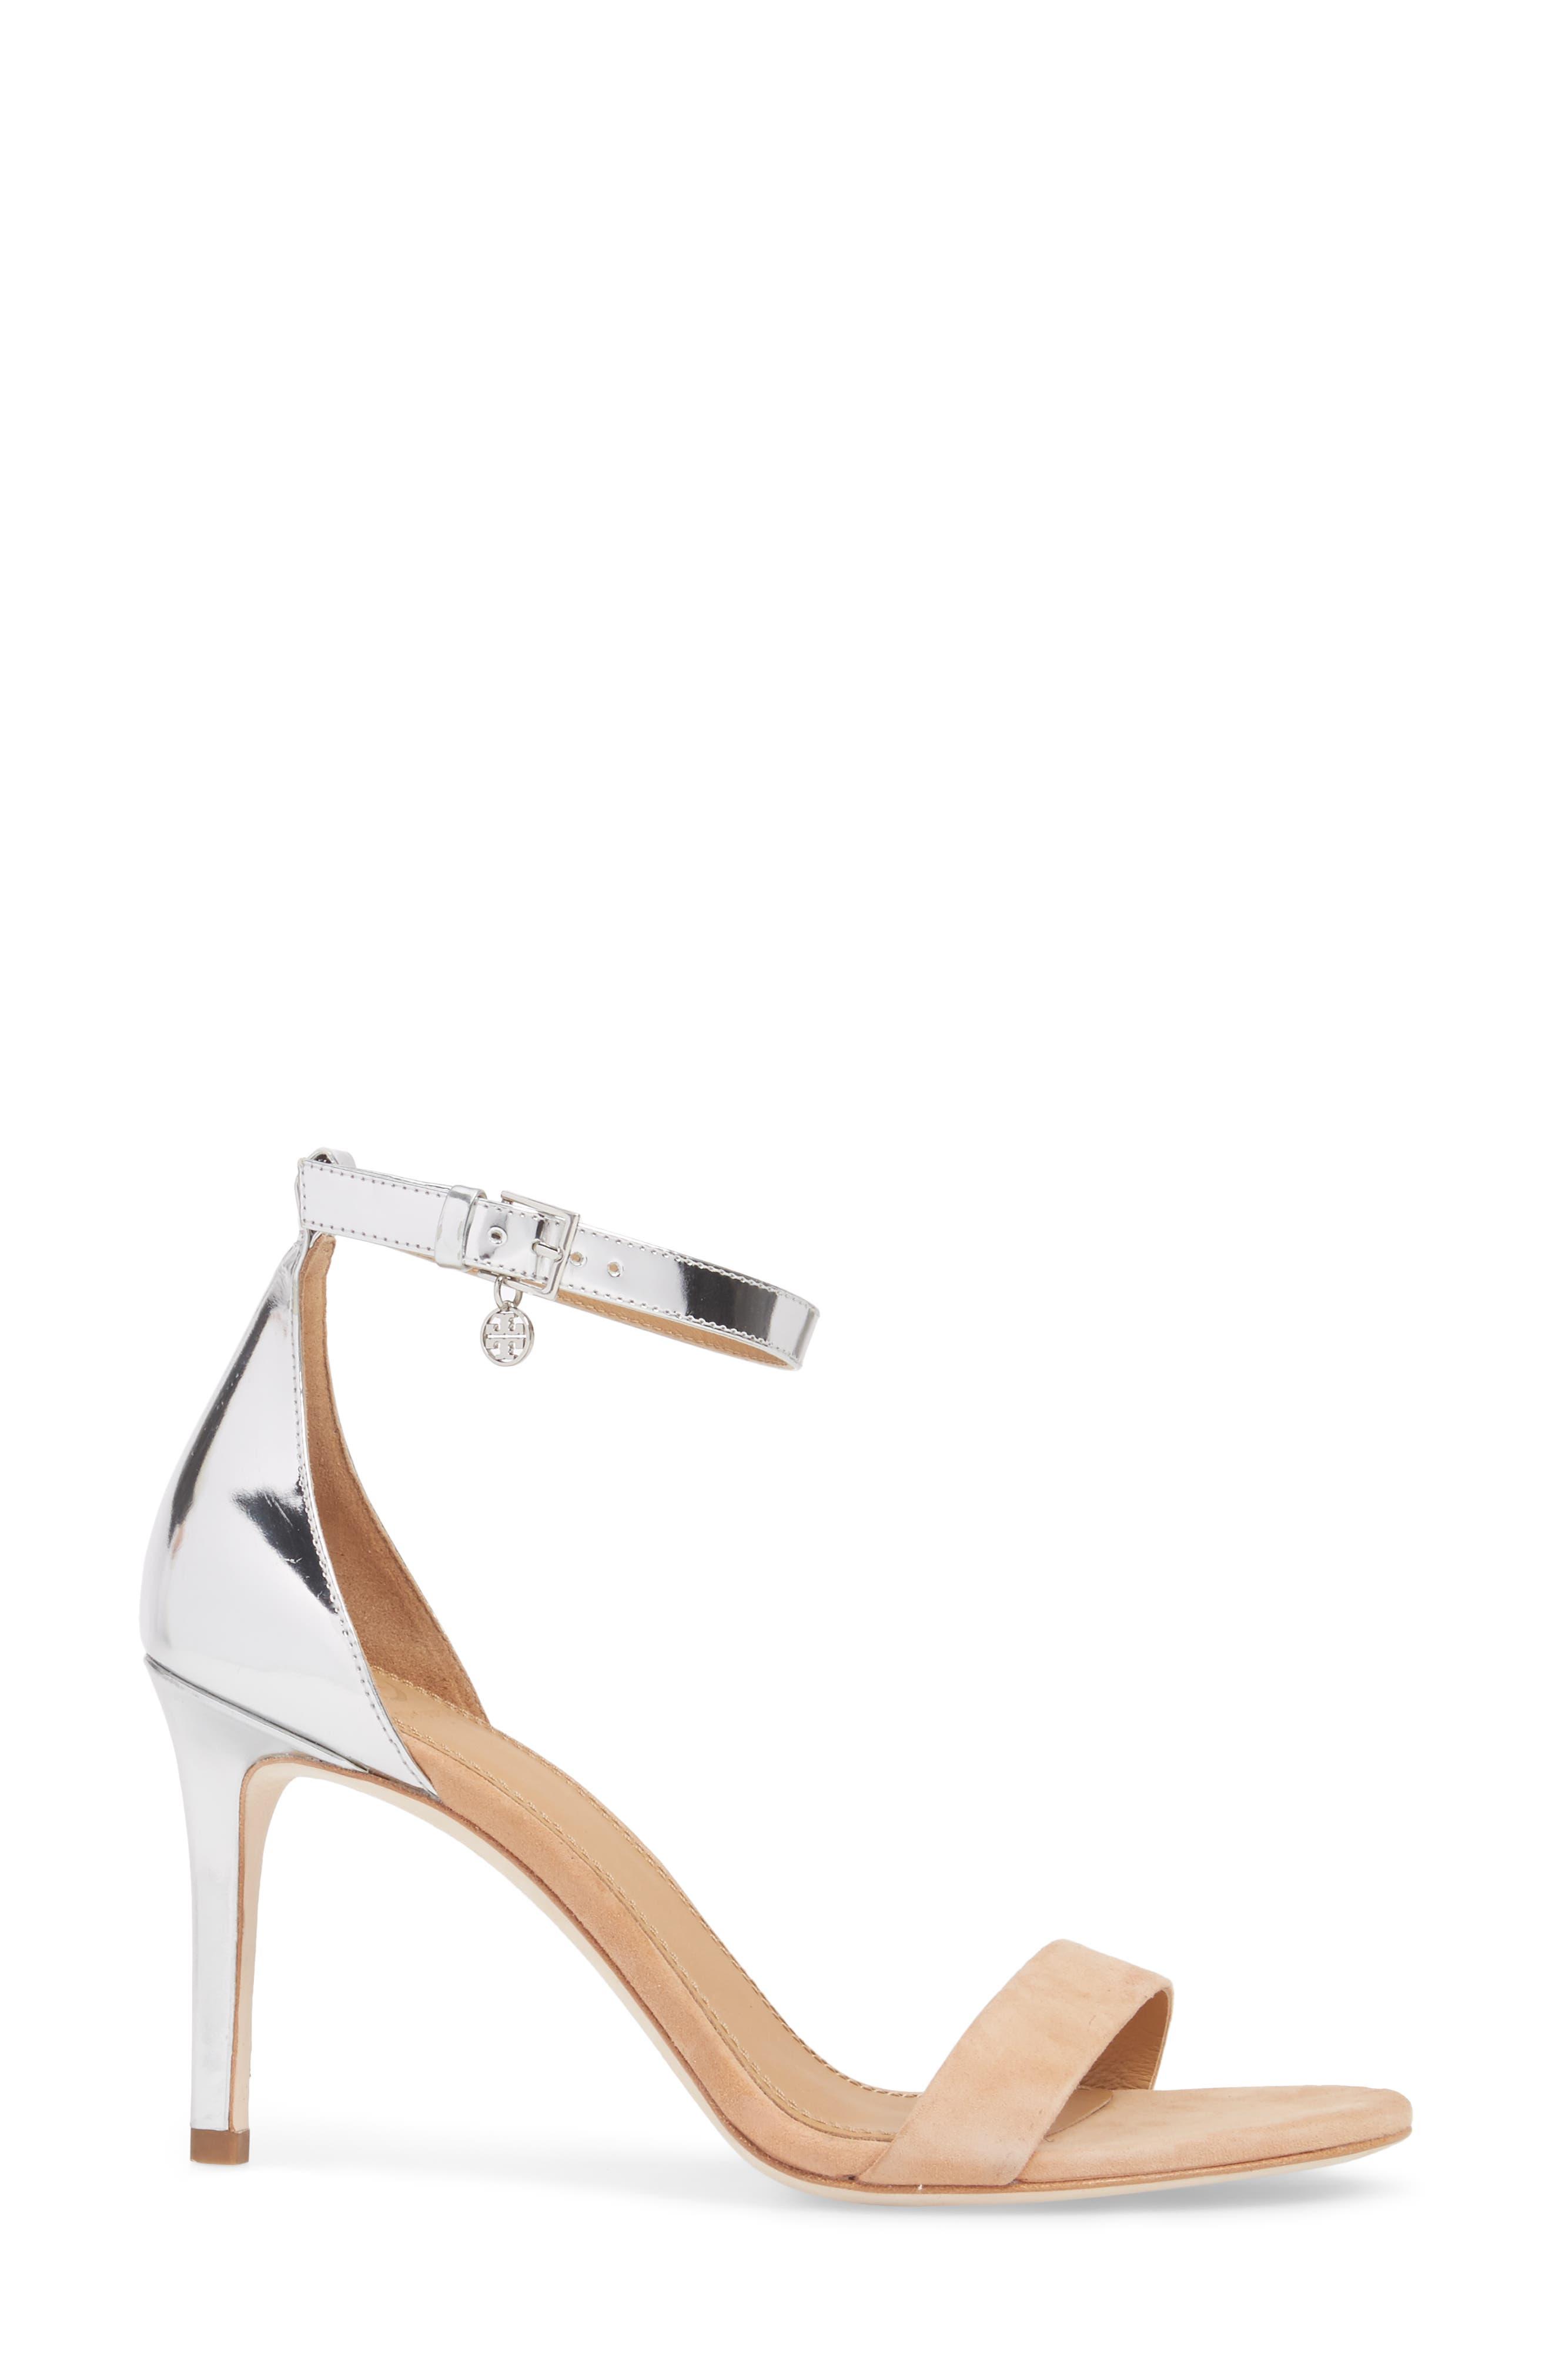 Ellie Ankle Strap Sandal,                             Alternate thumbnail 3, color,                             020